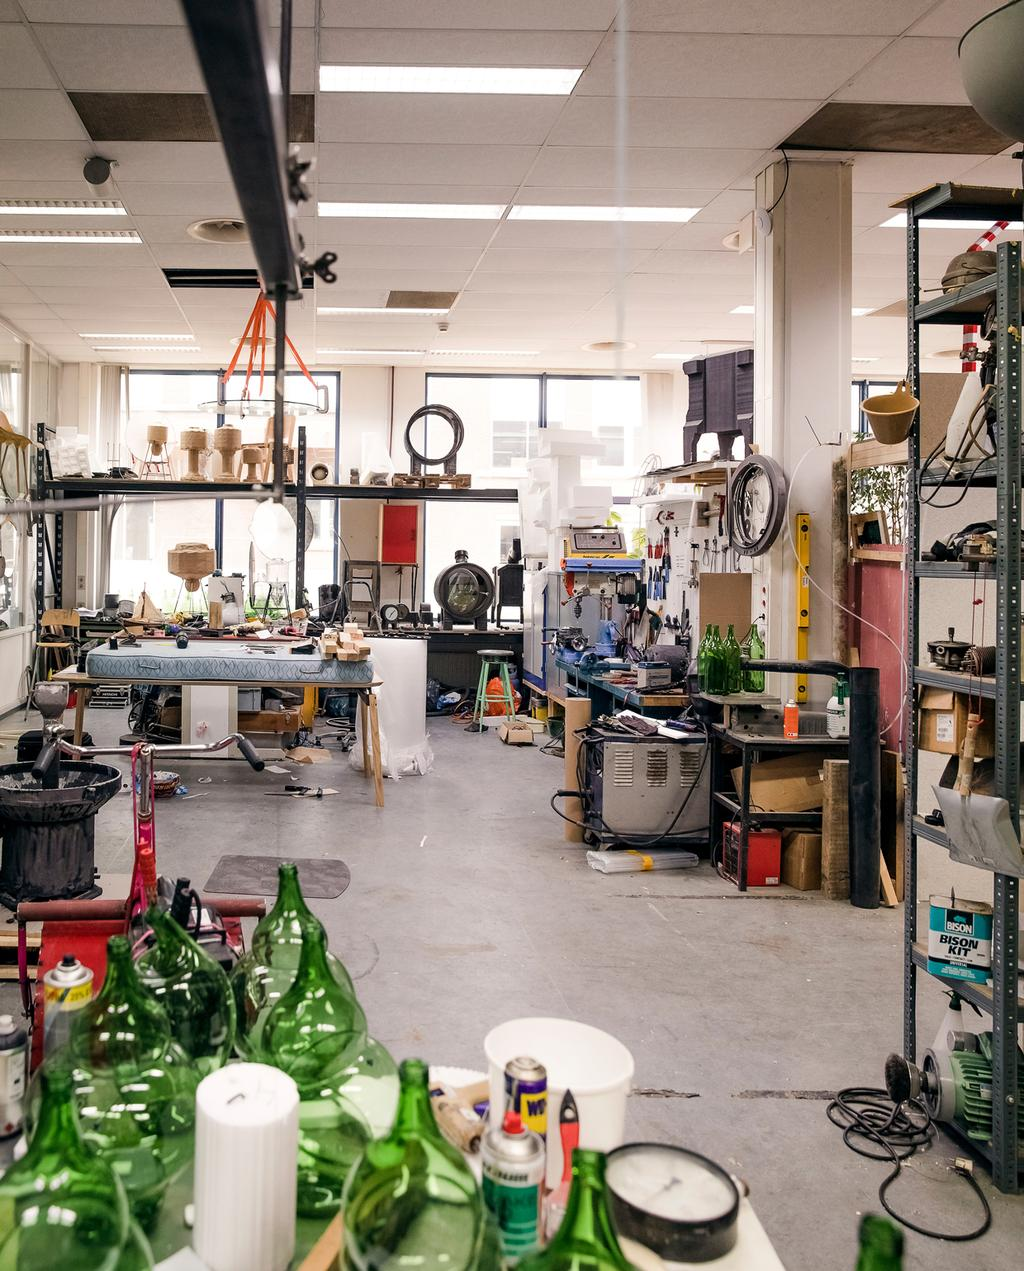 vtwonen 9-2019 | Ambacht Klaas Kuiken atelier groen glas | Ambacht glas blazen